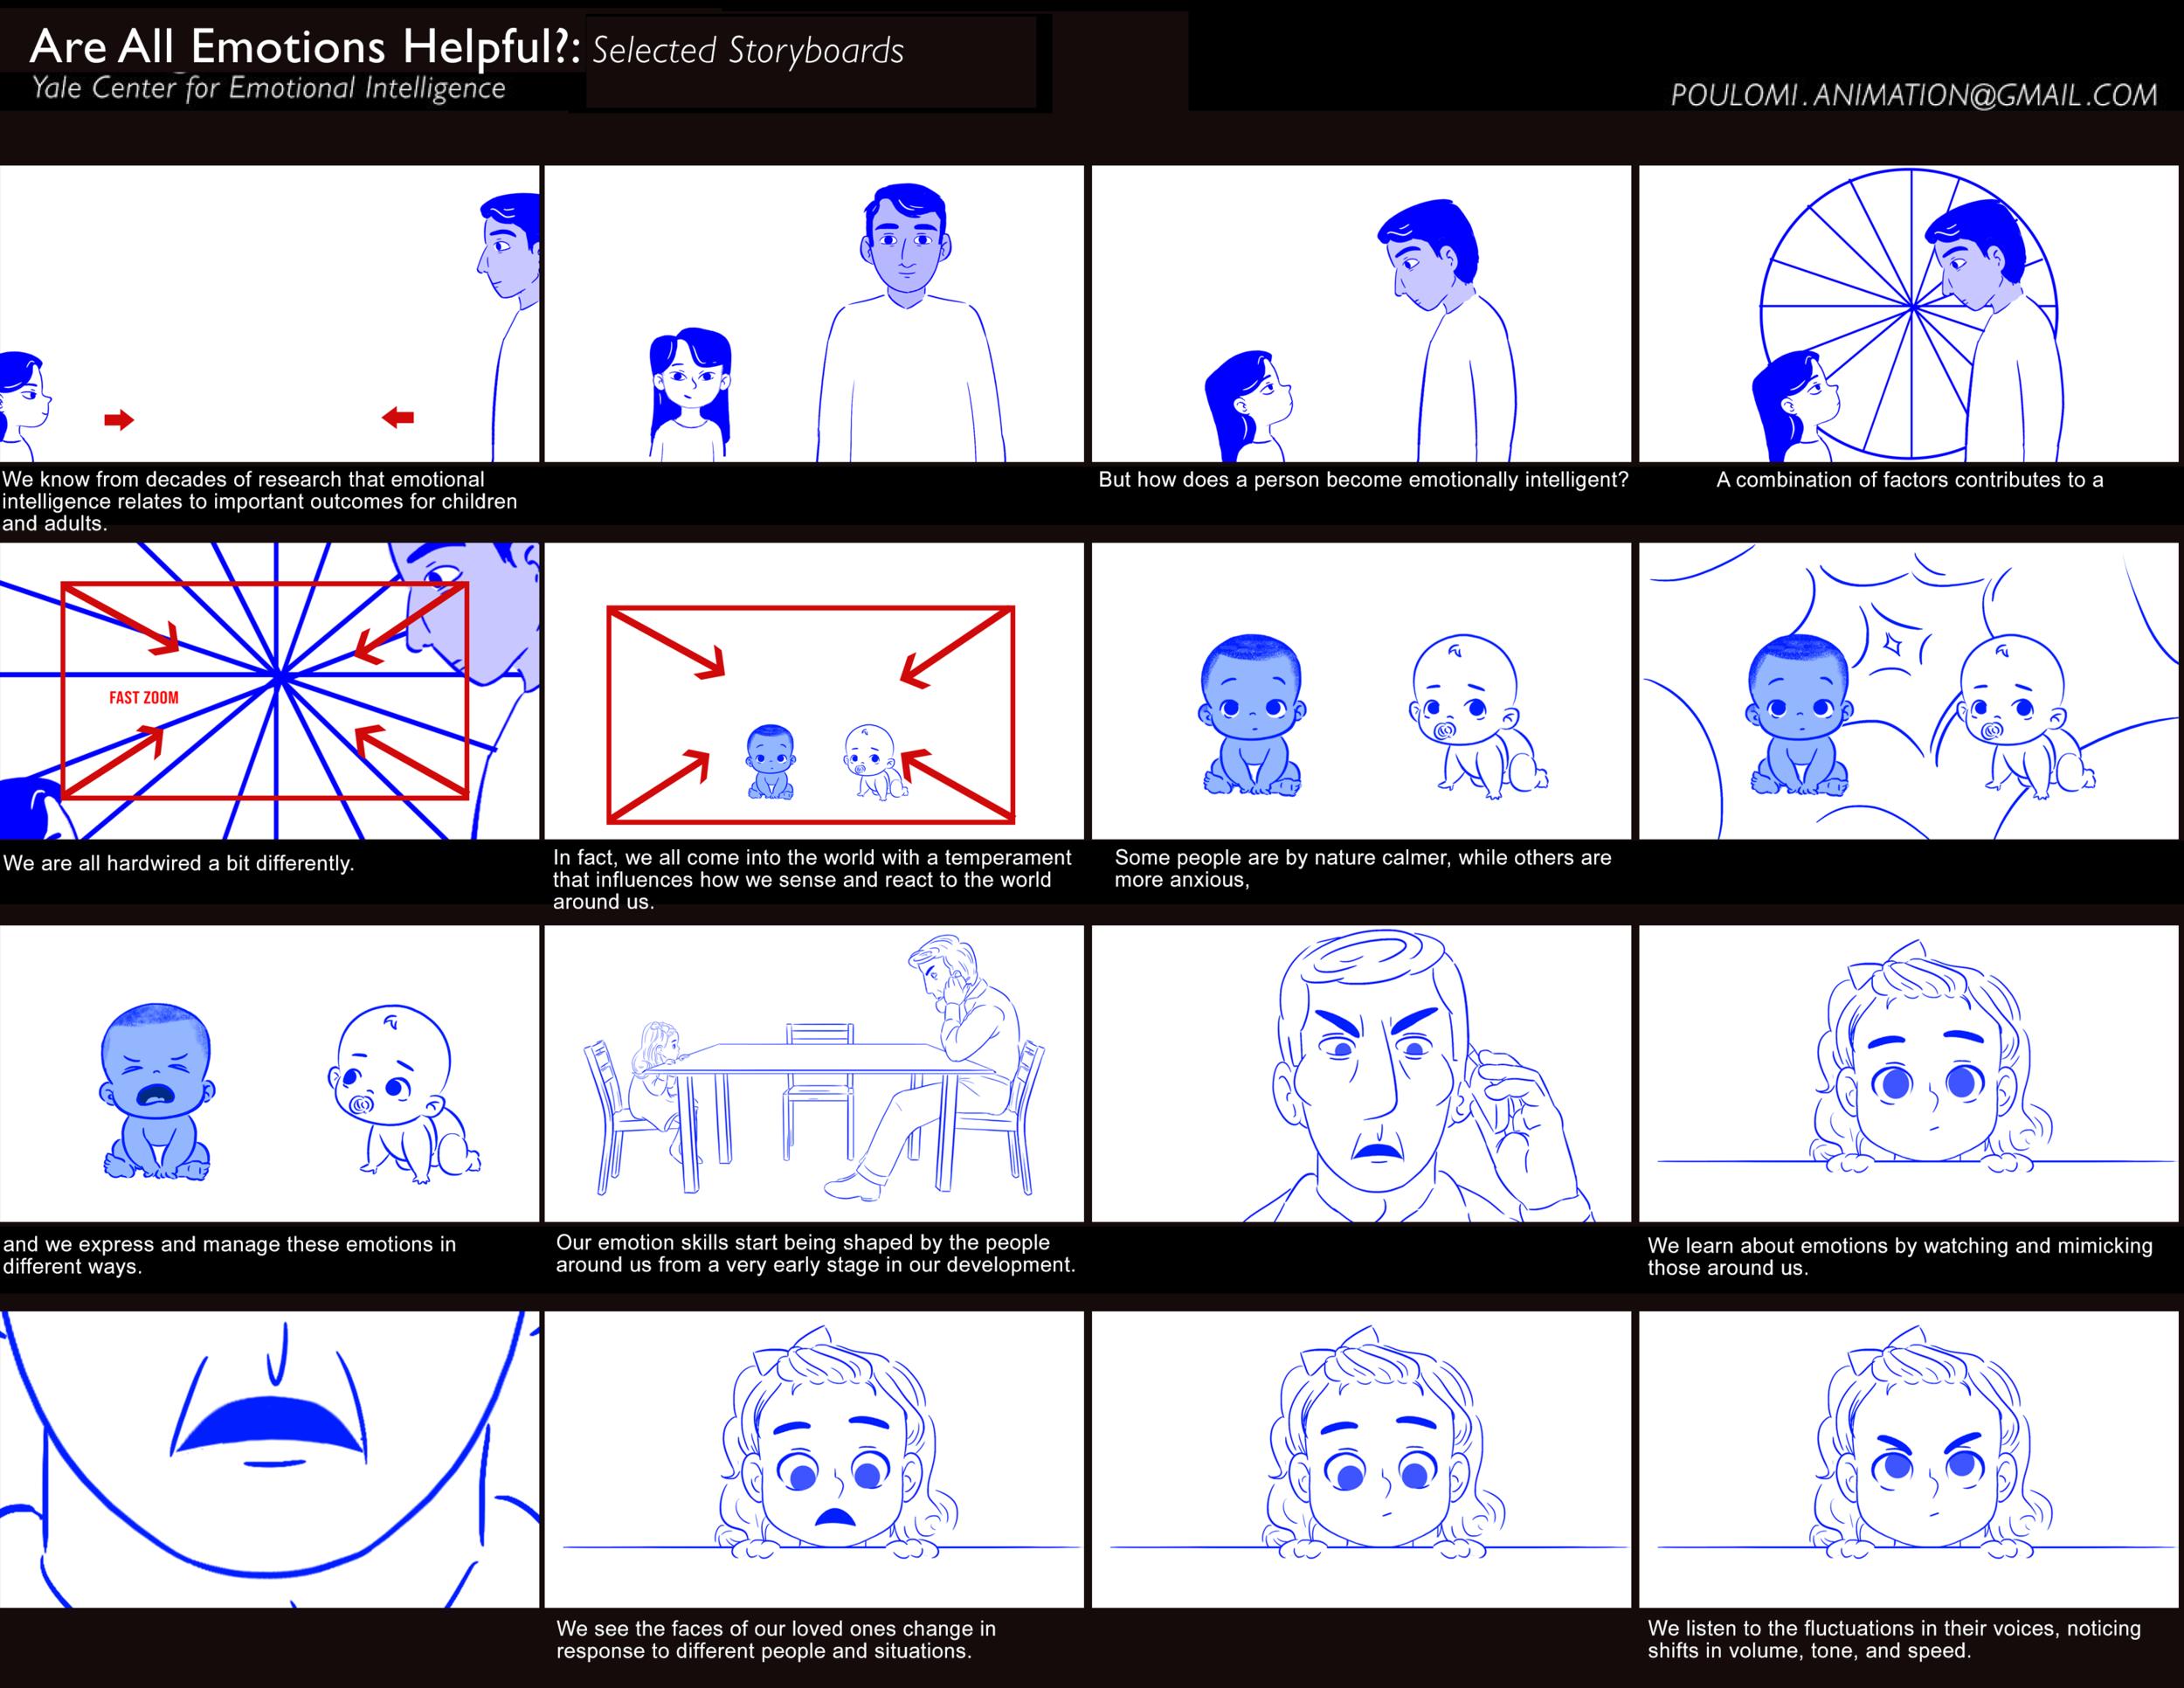 01_Storyboarding Portfolio-12 copy.png